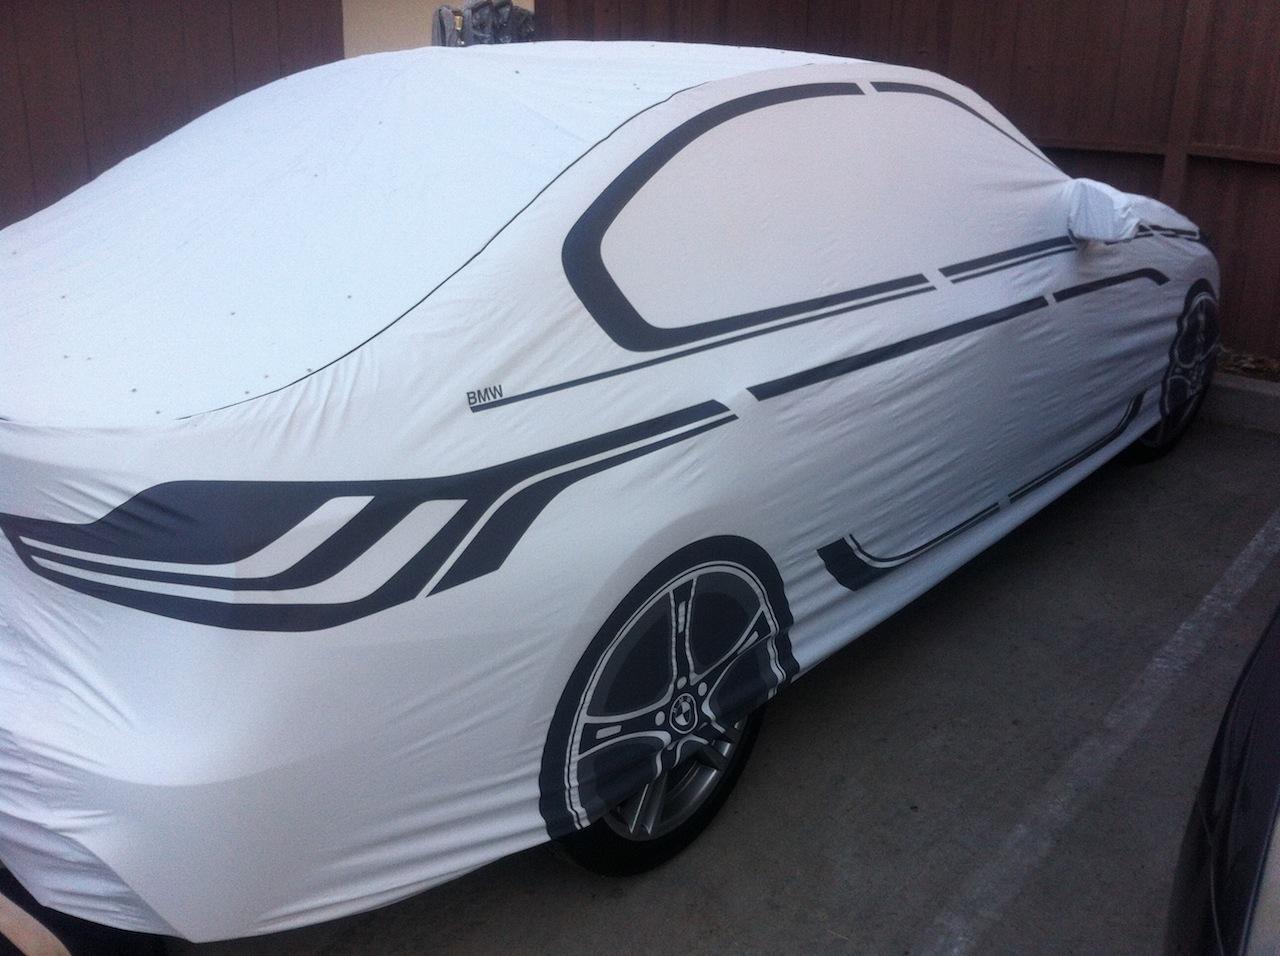 F30 Oem Car Cover